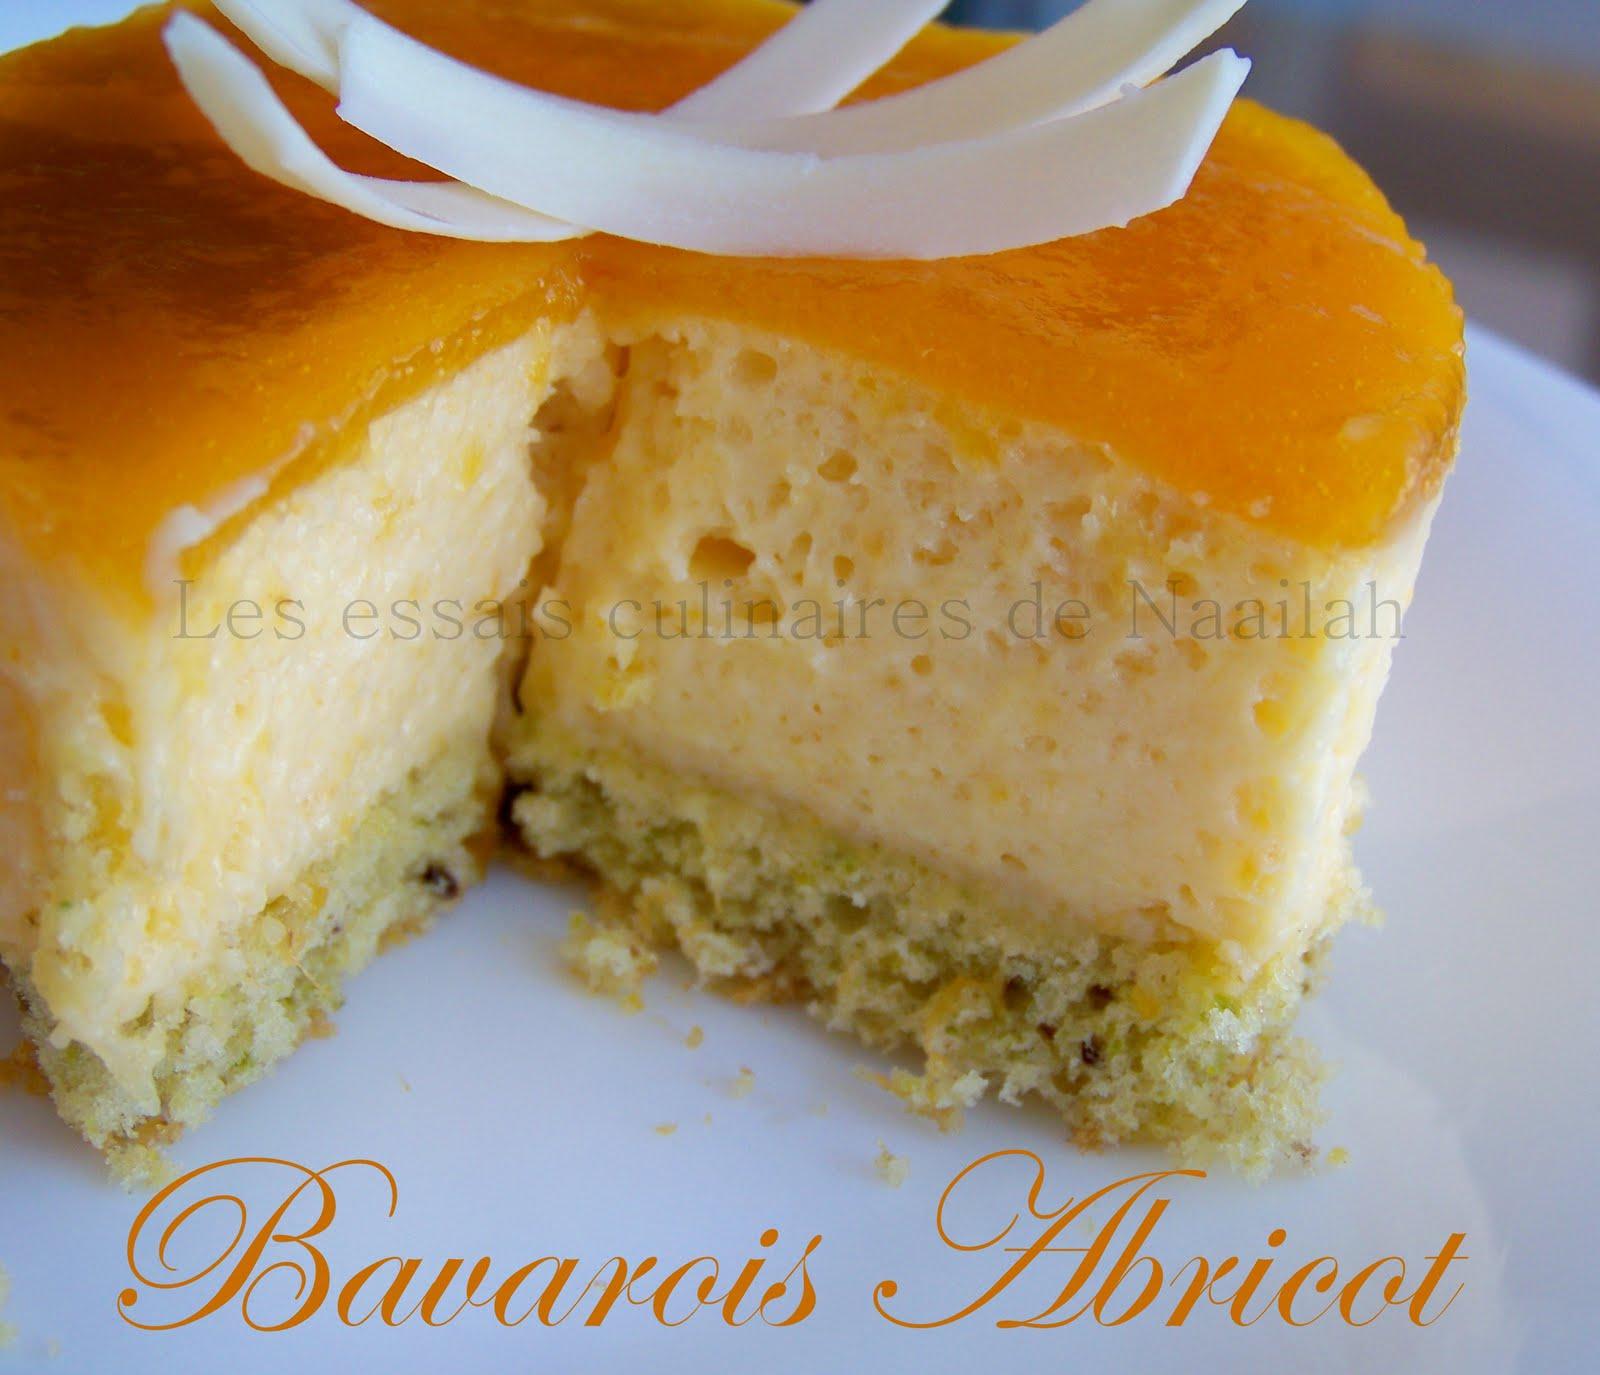 minis bavarois 224 l abricot avec agar agar blogs de cuisine